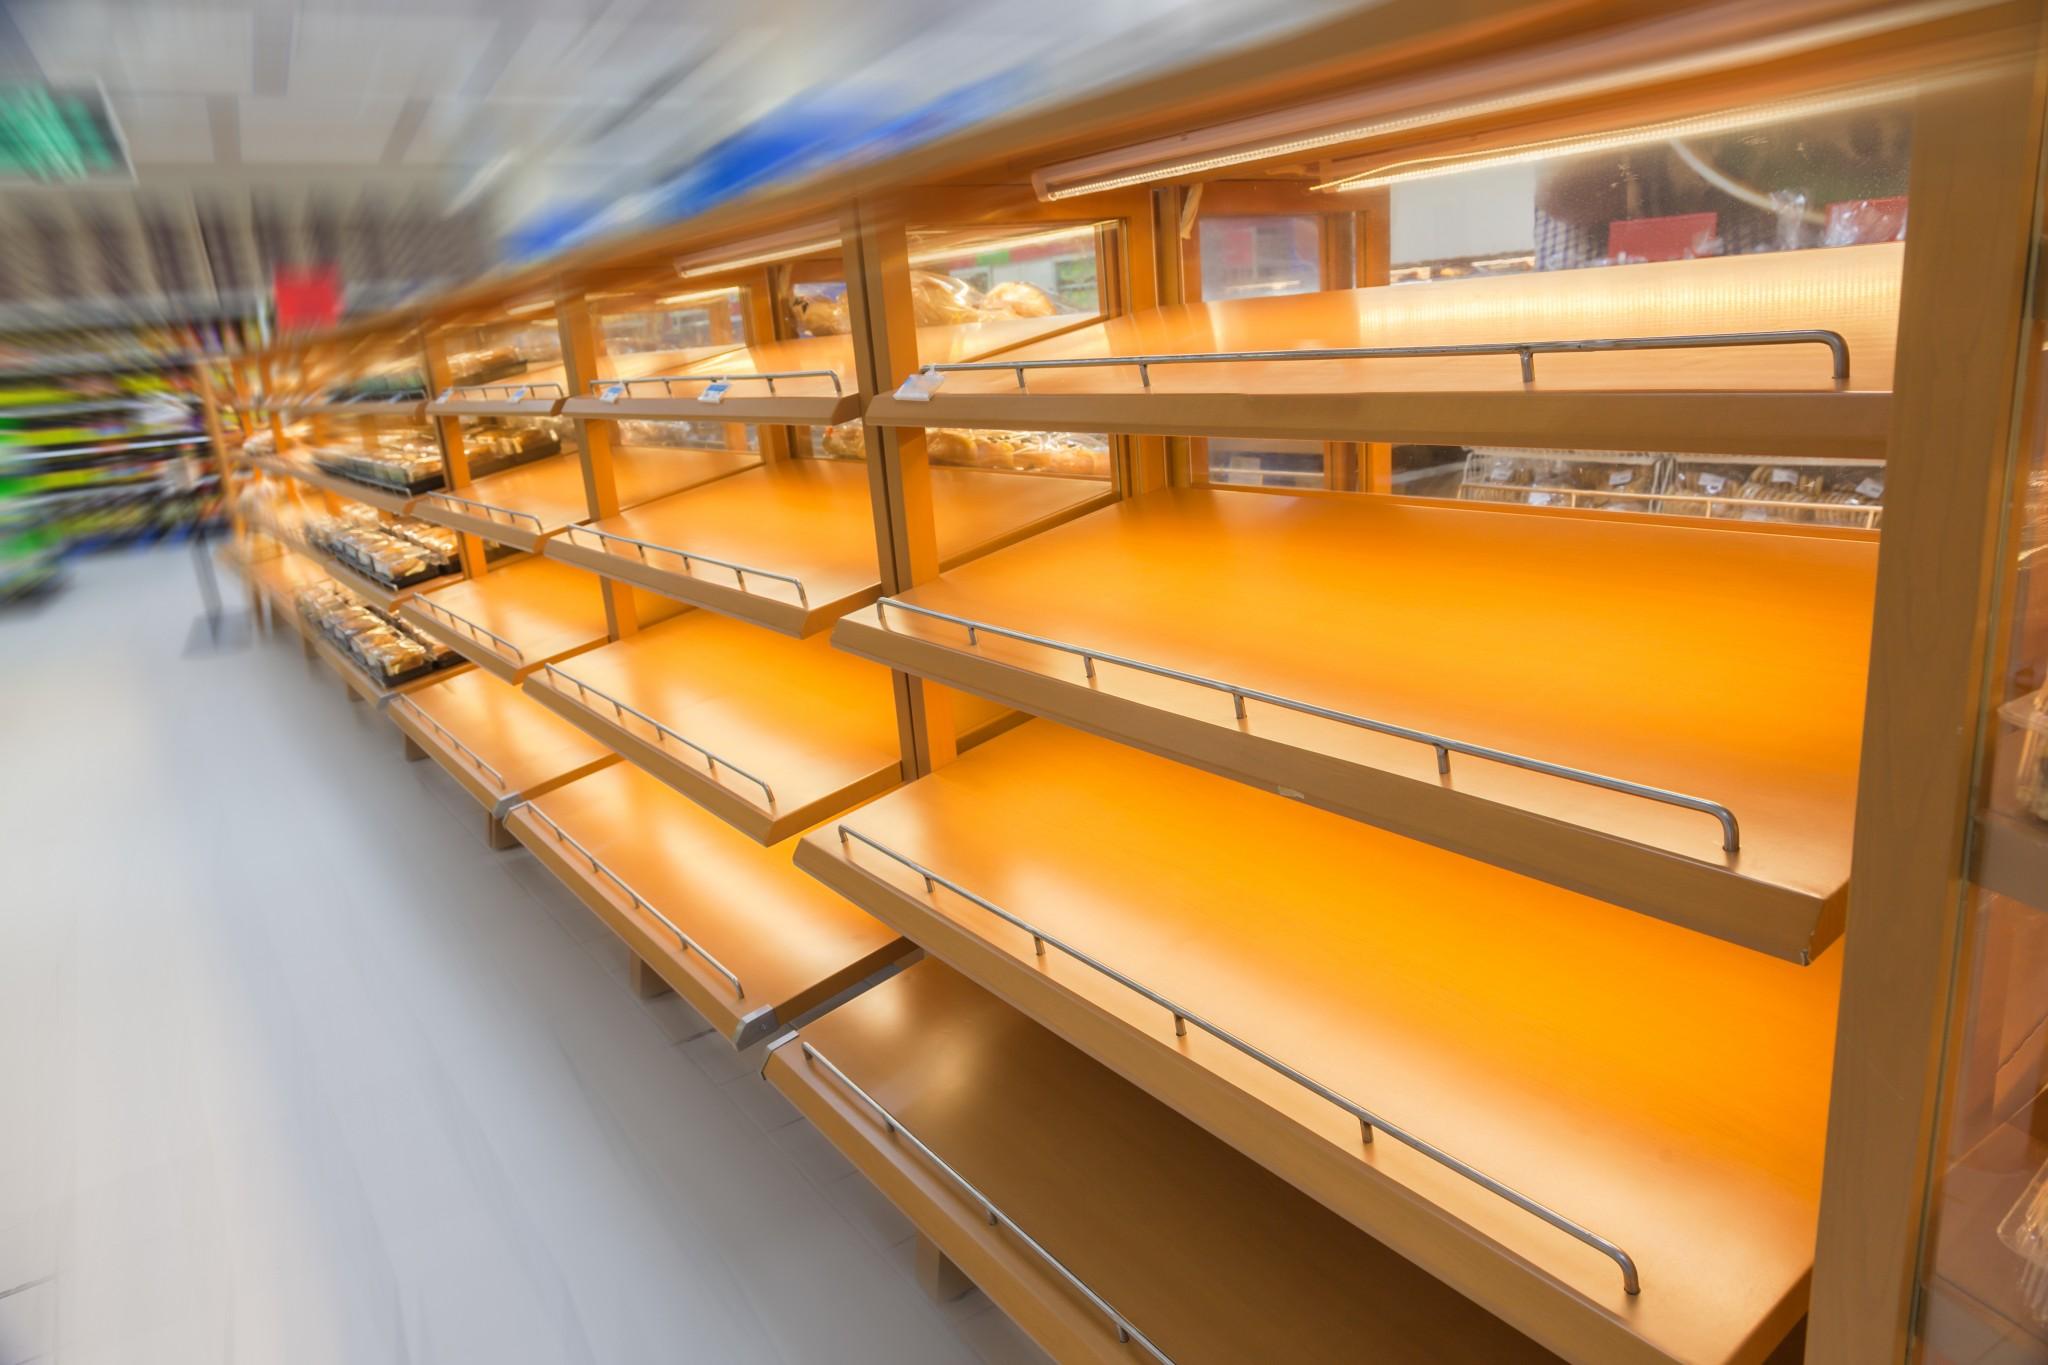 Weekly economic news roundup and Venezuela's food shortages